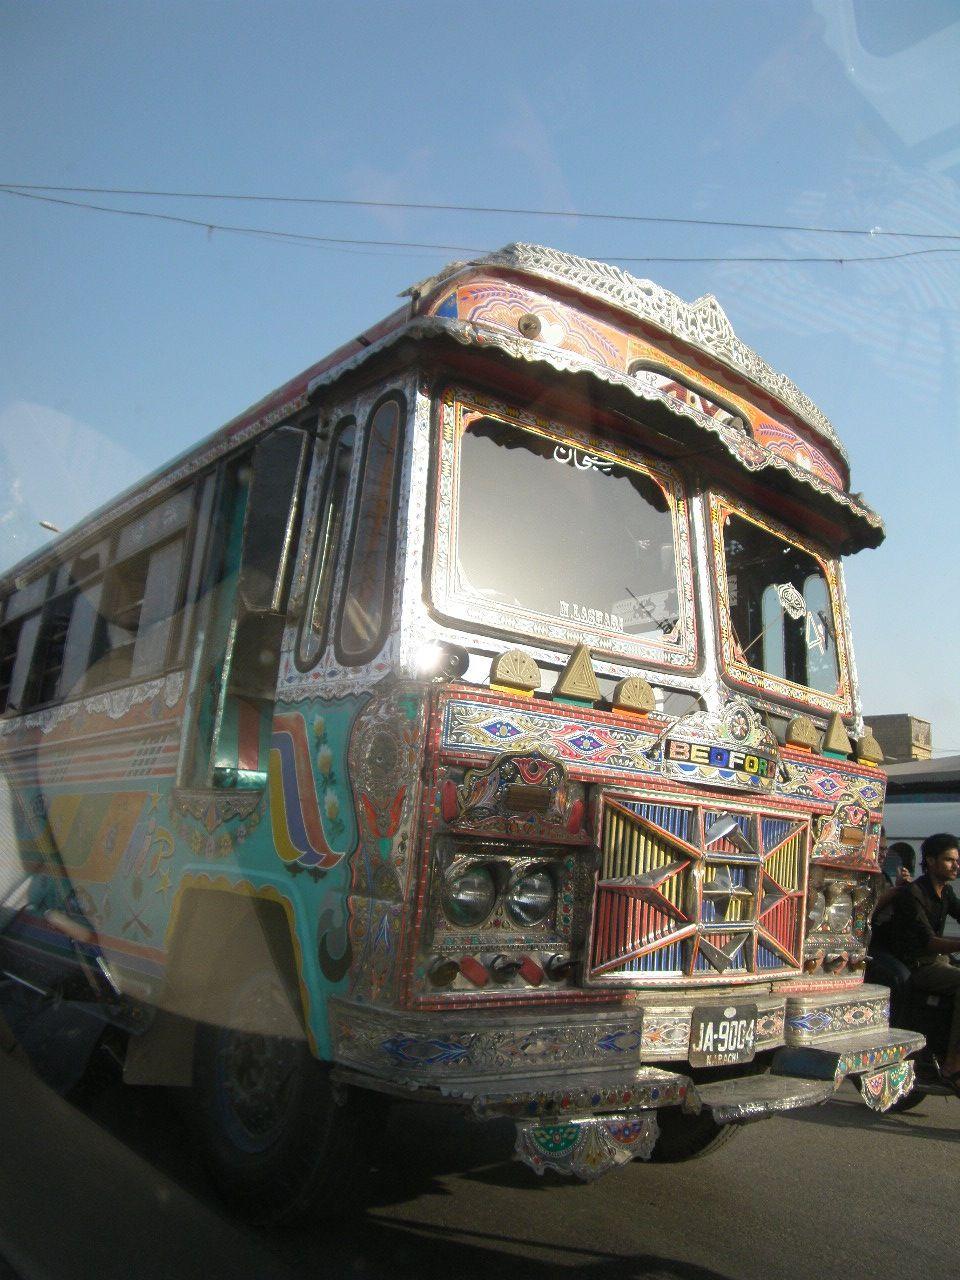 Bus Bedford At Karachi Recreational Vehicles Vehicles Rider